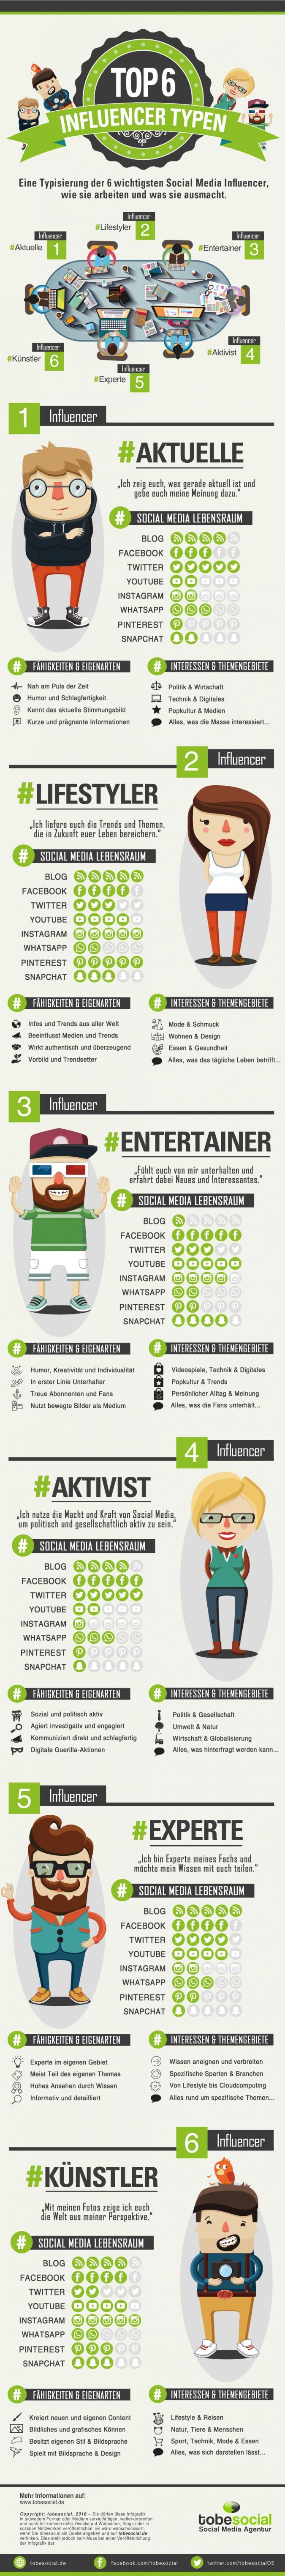 infografik-influencer-marketing-top-meinunsgfuehrer-social-media-agentur-youtube-facebook-instagram-empfehlungsmarketing_0